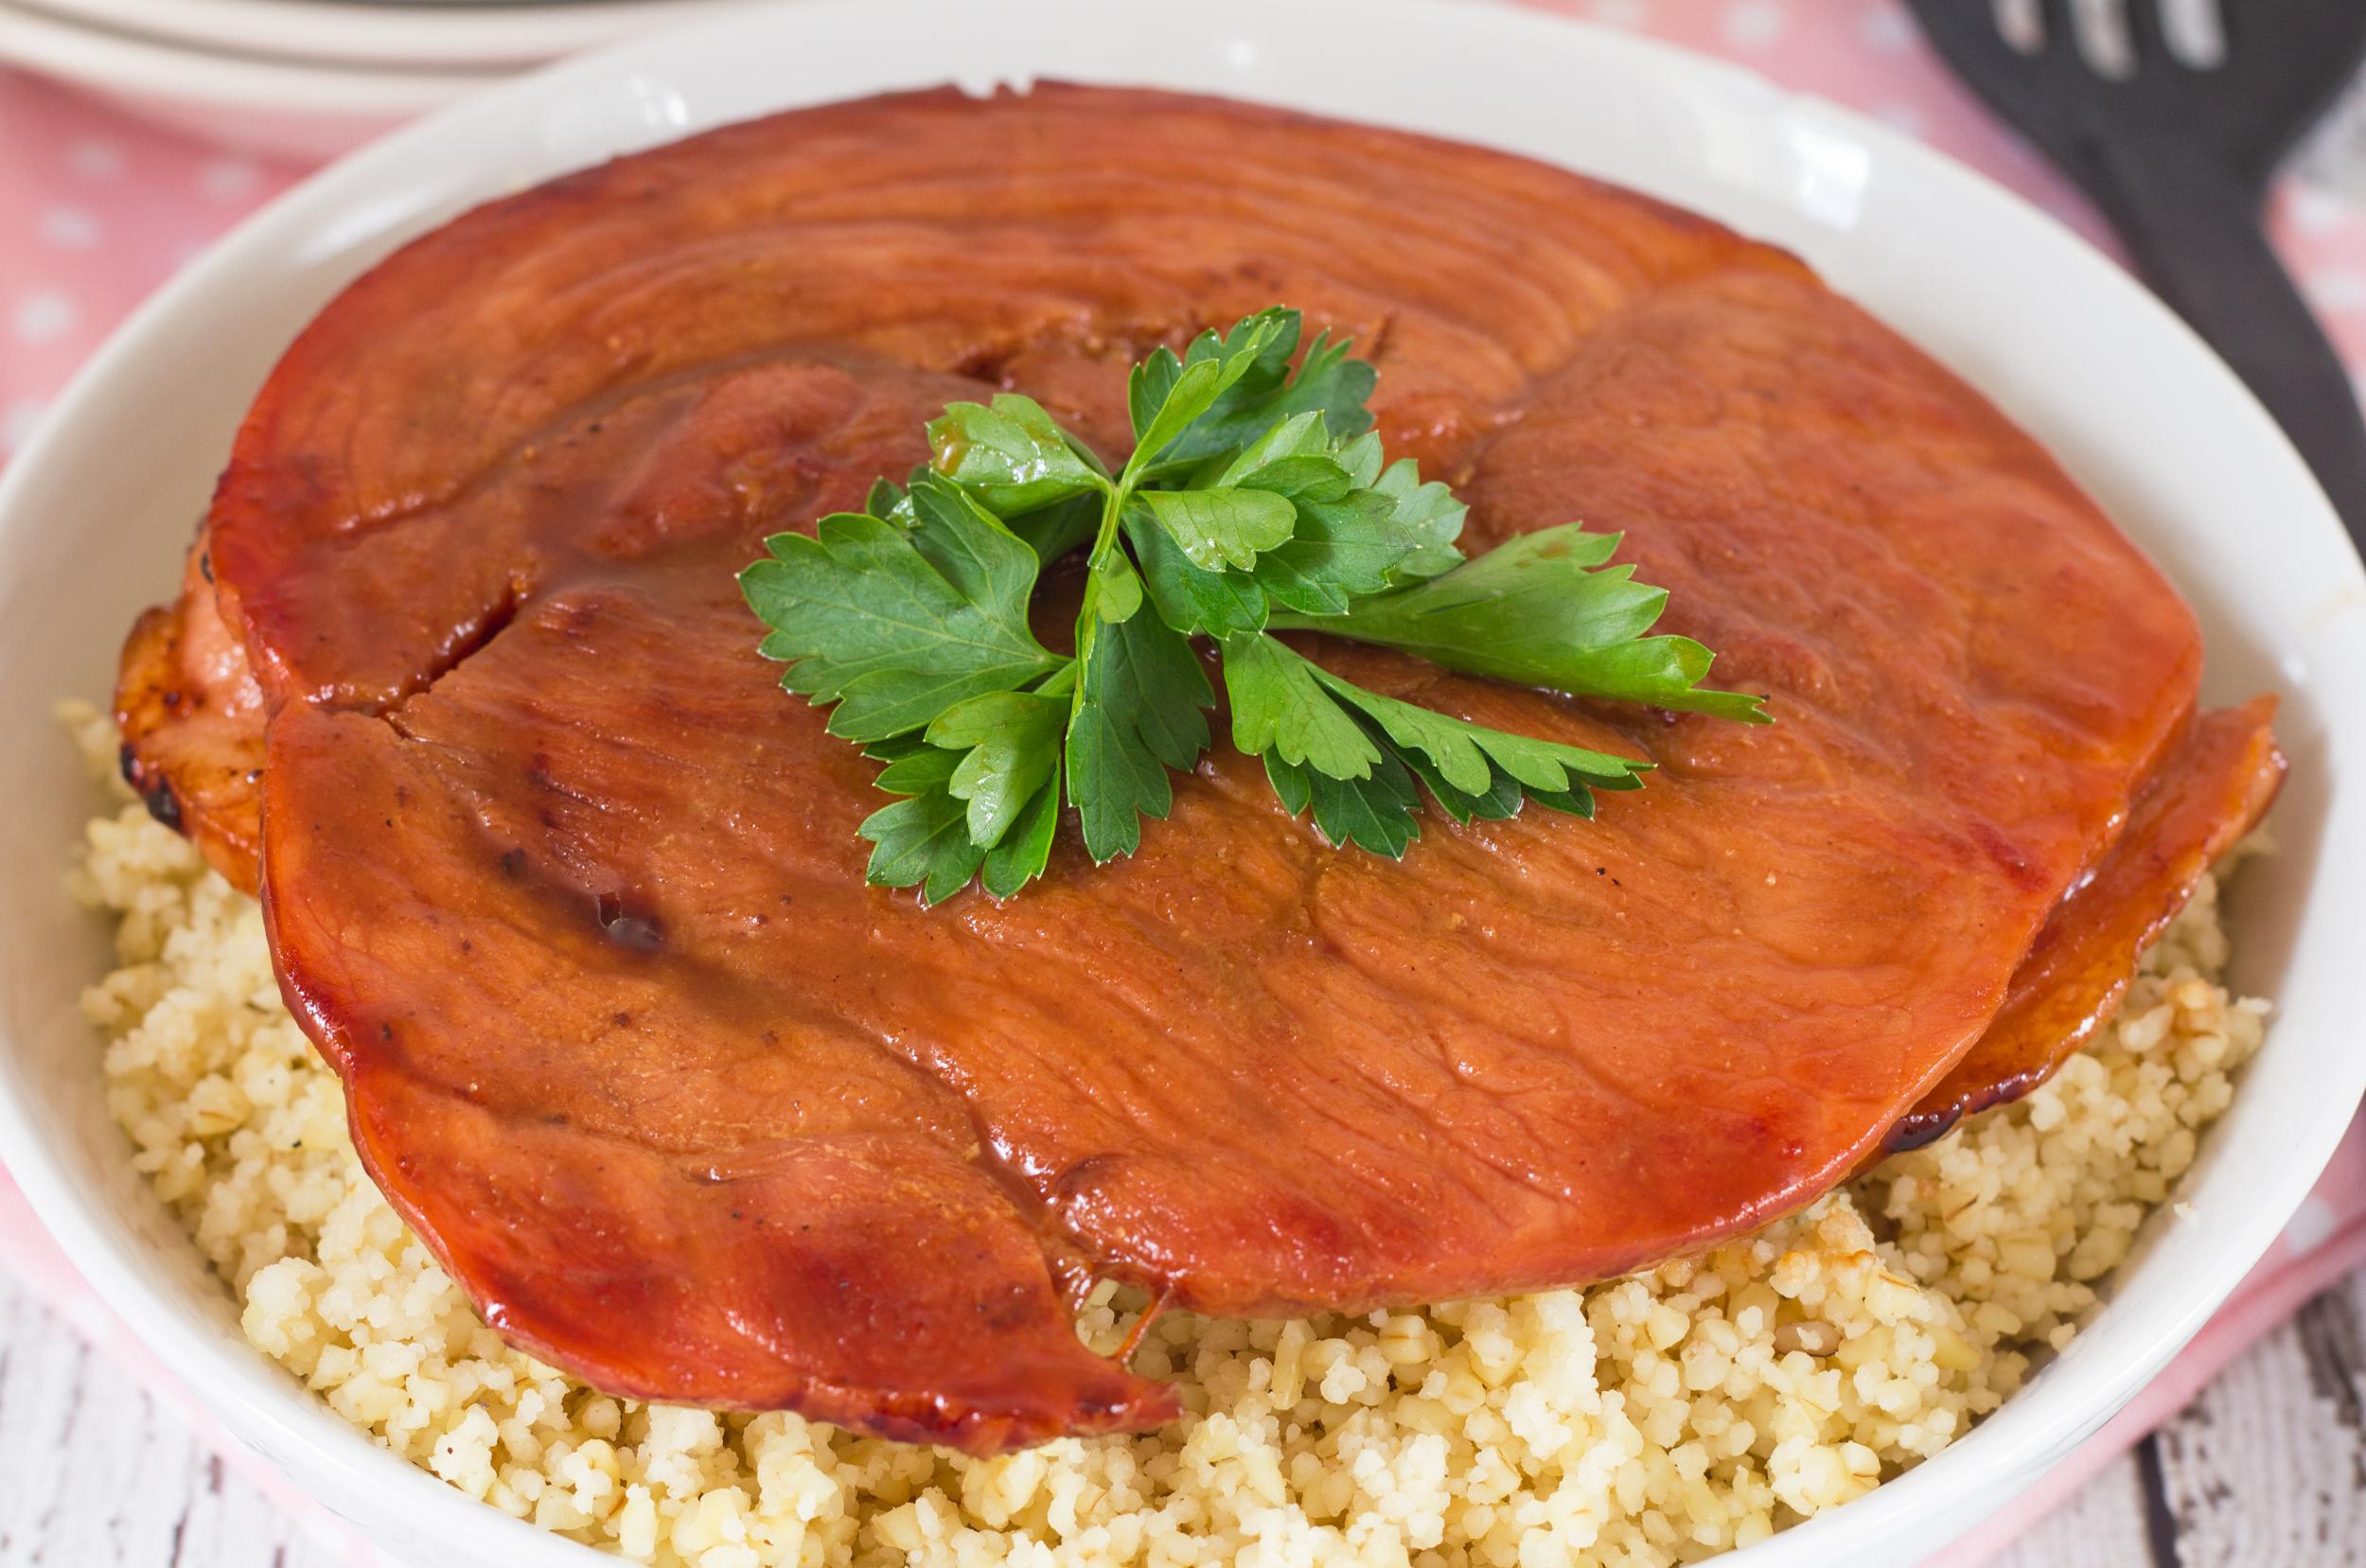 Maple Glazed Ham Steak